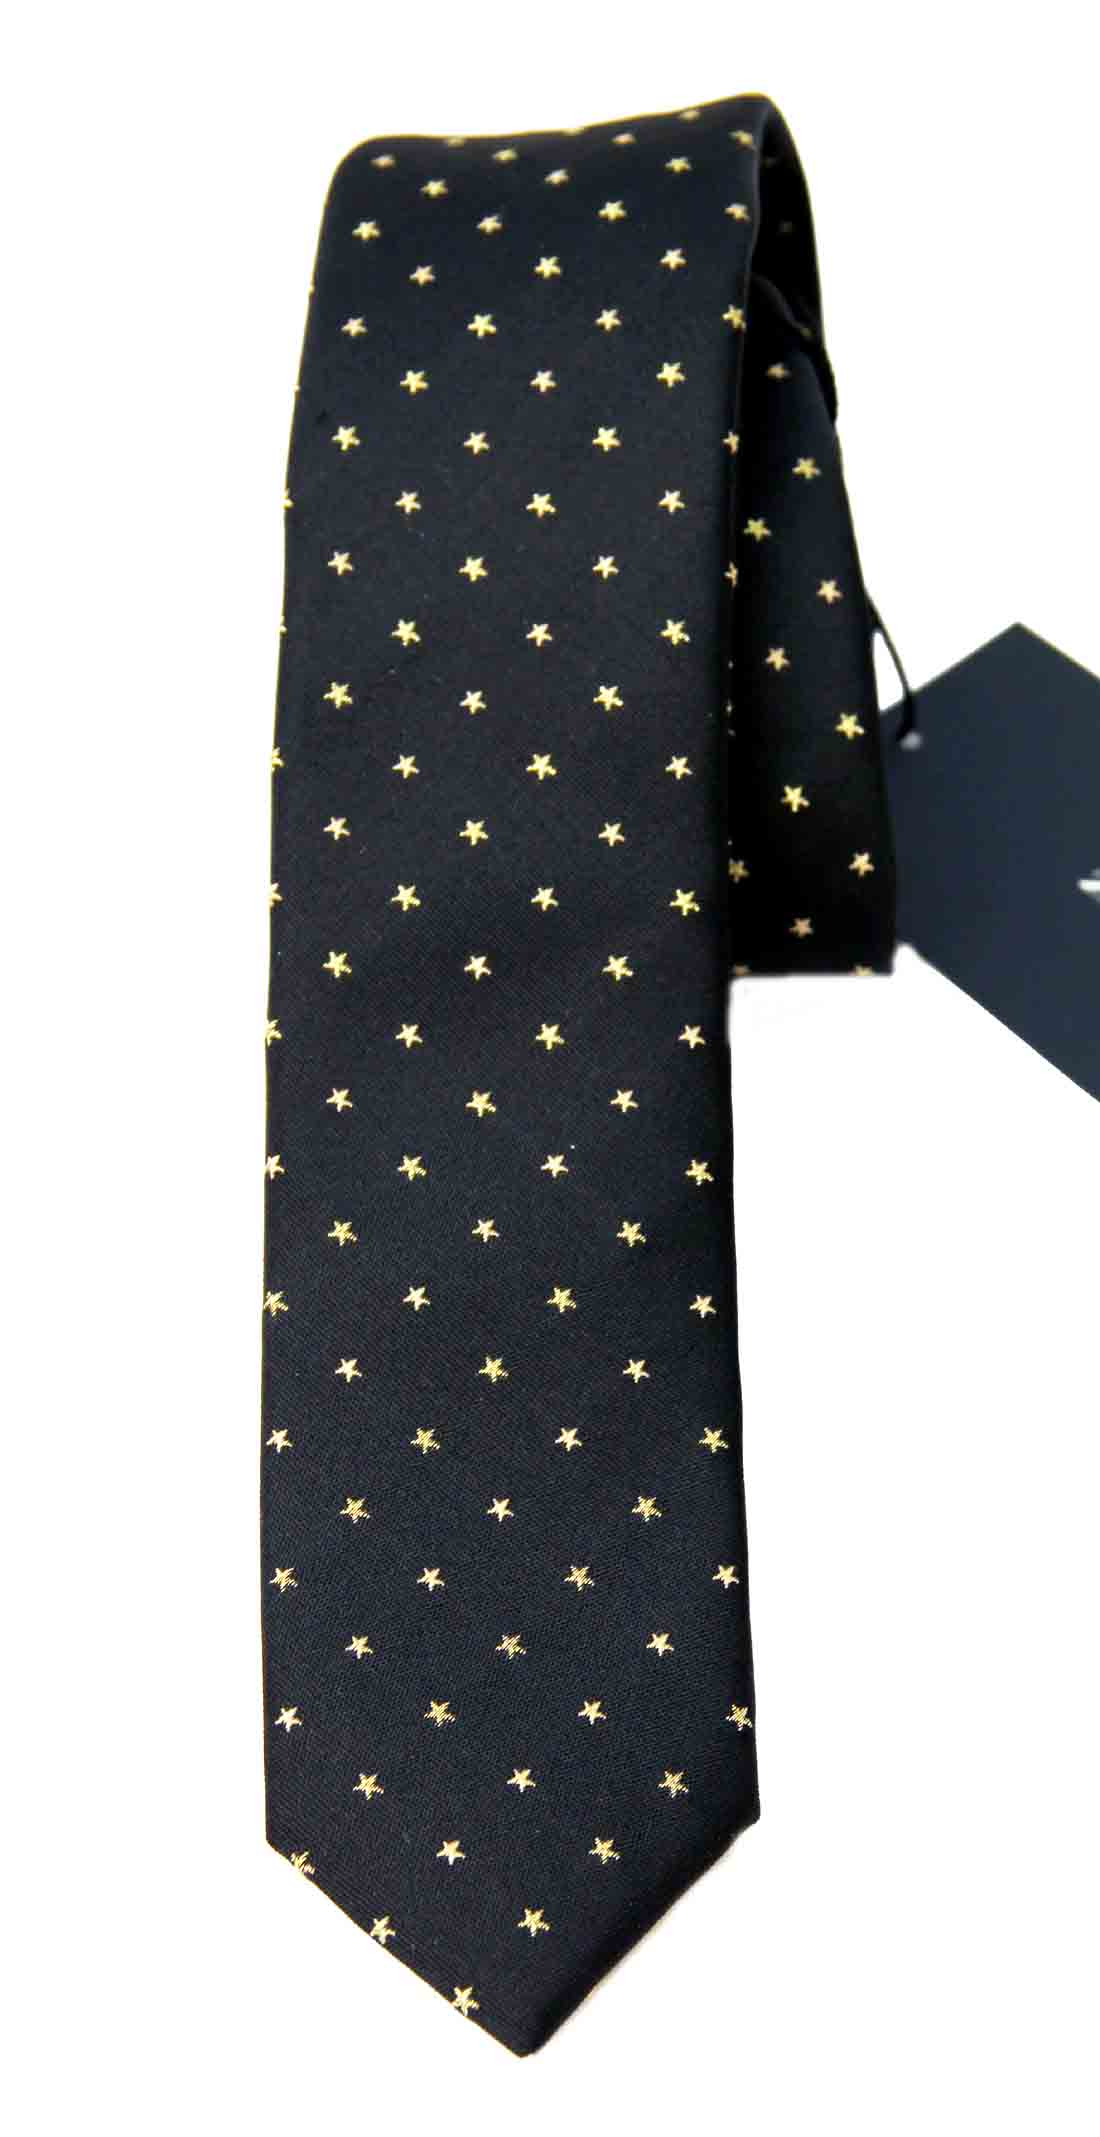 Zara Tie Silk Blend Narrow Black Gold Stars Narrow Men's